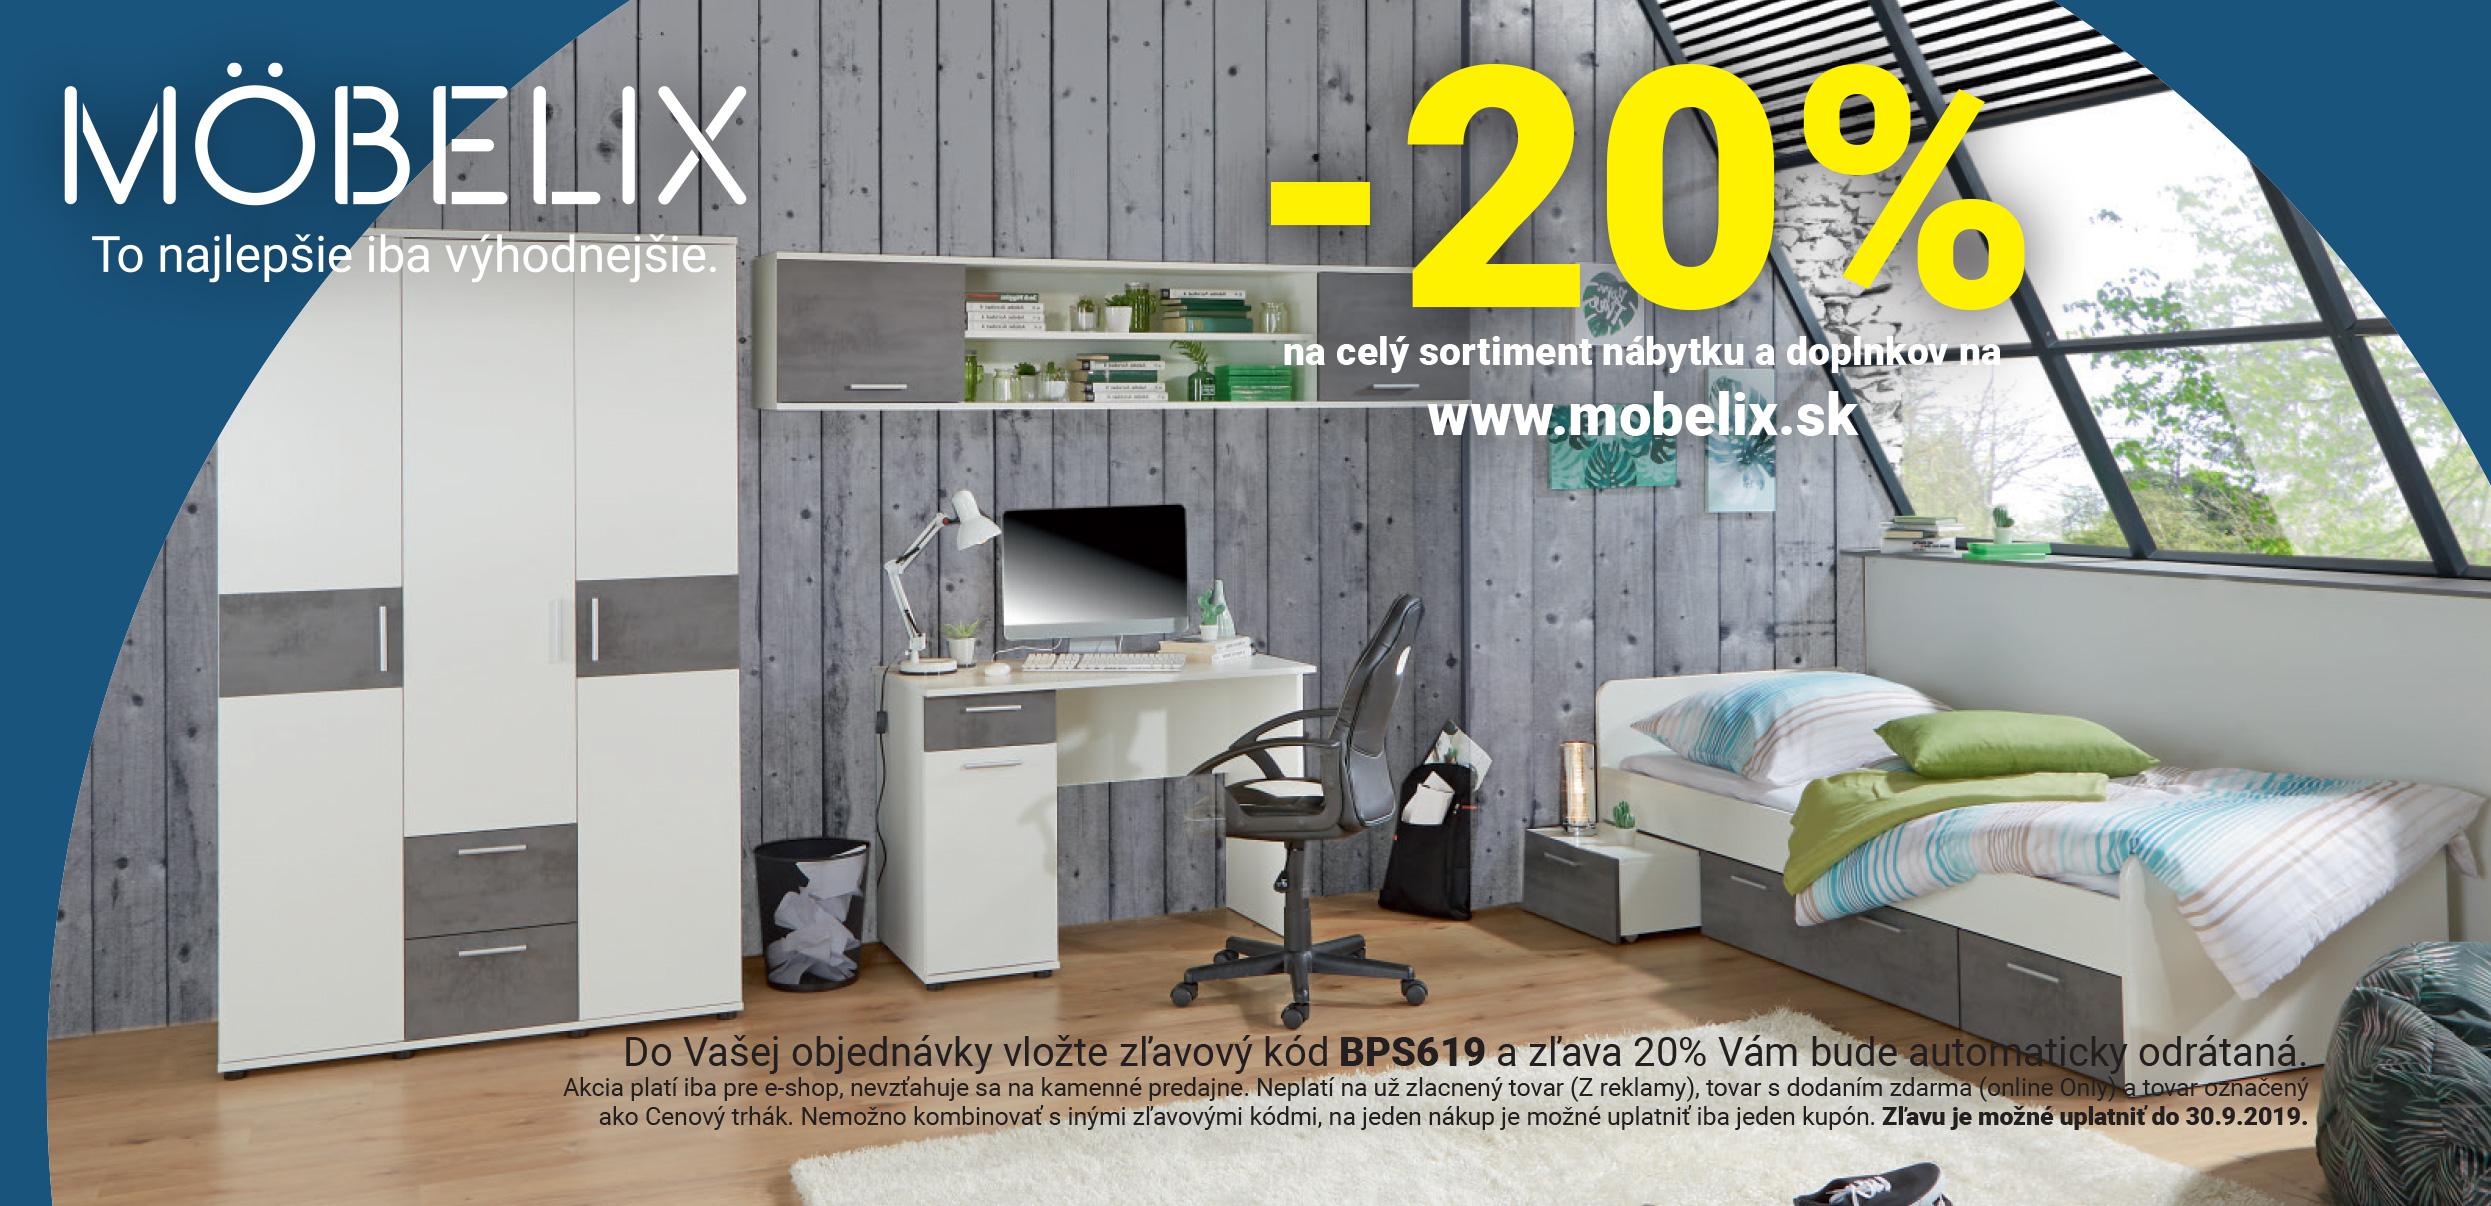 20 Moebelix slevov kdy a slevy srpen 2020